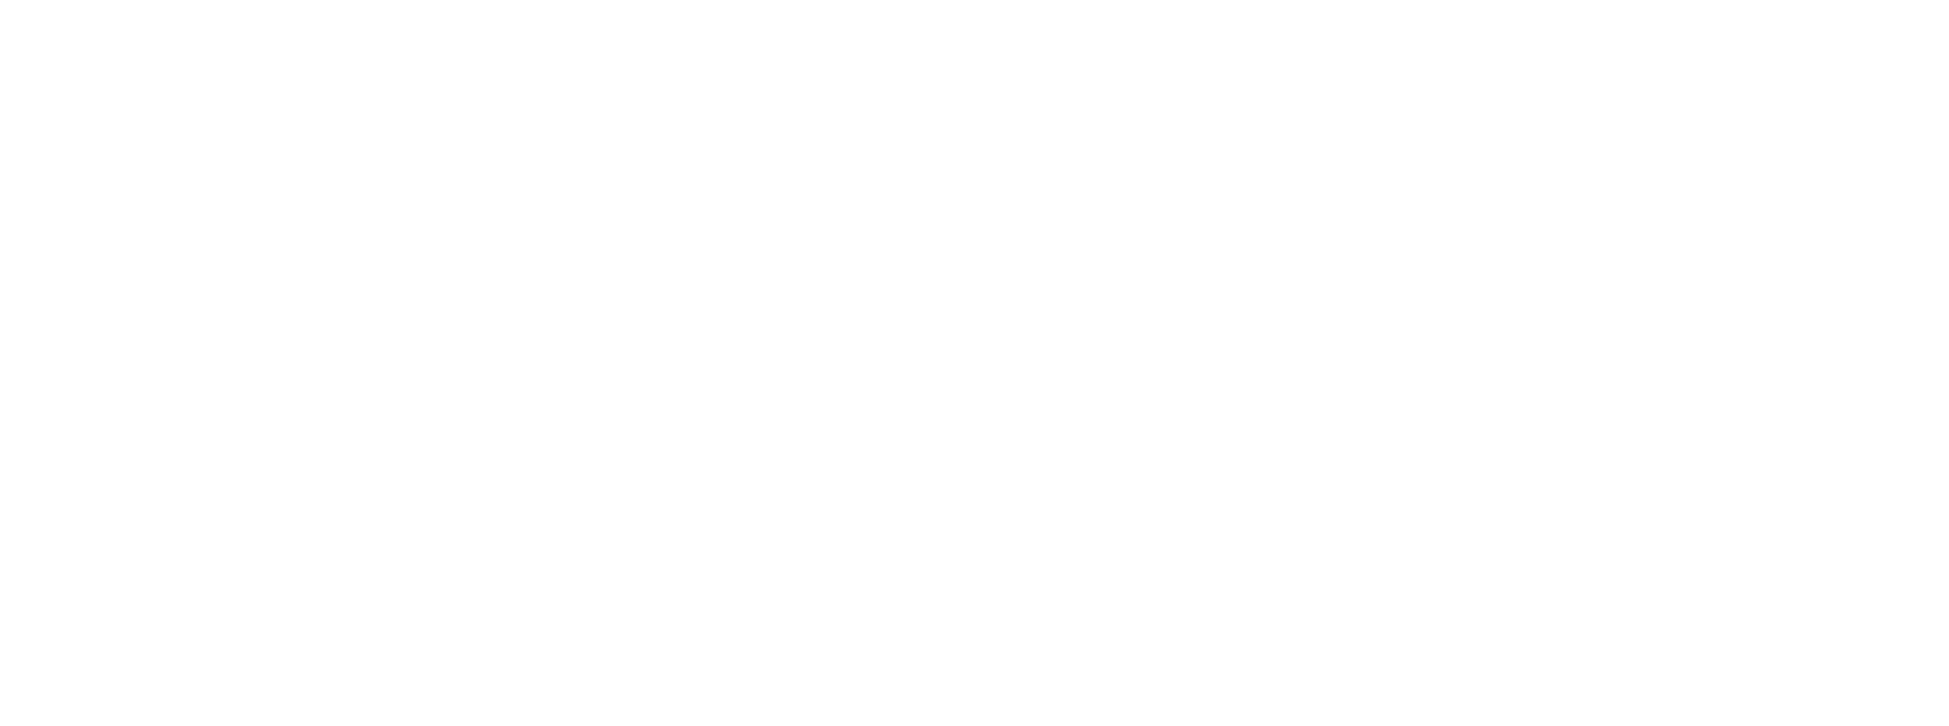 Green Network Transparent